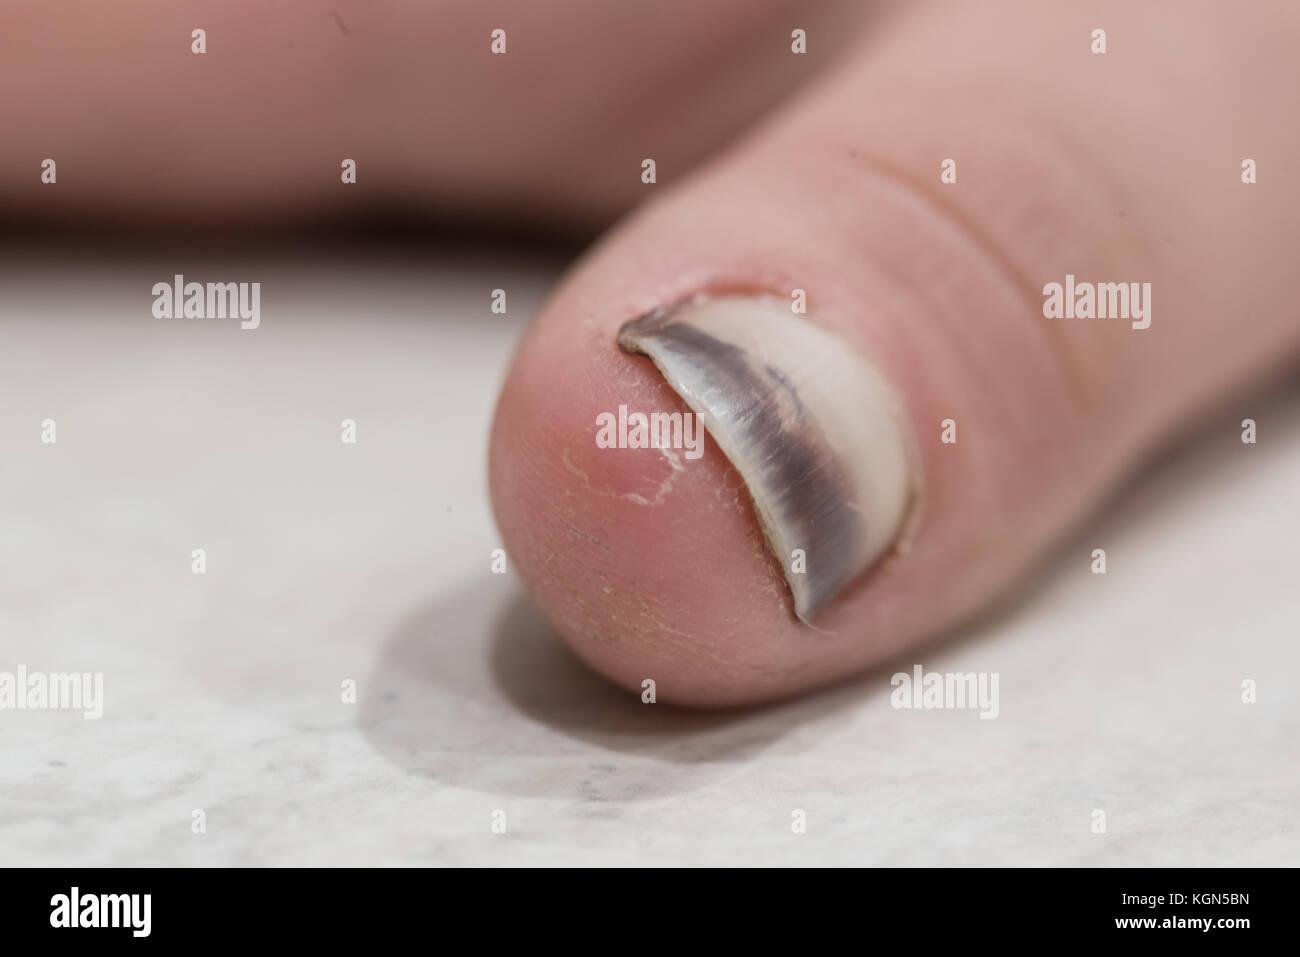 Damaged Fingernail Stock Photos & Damaged Fingernail Stock Images ...